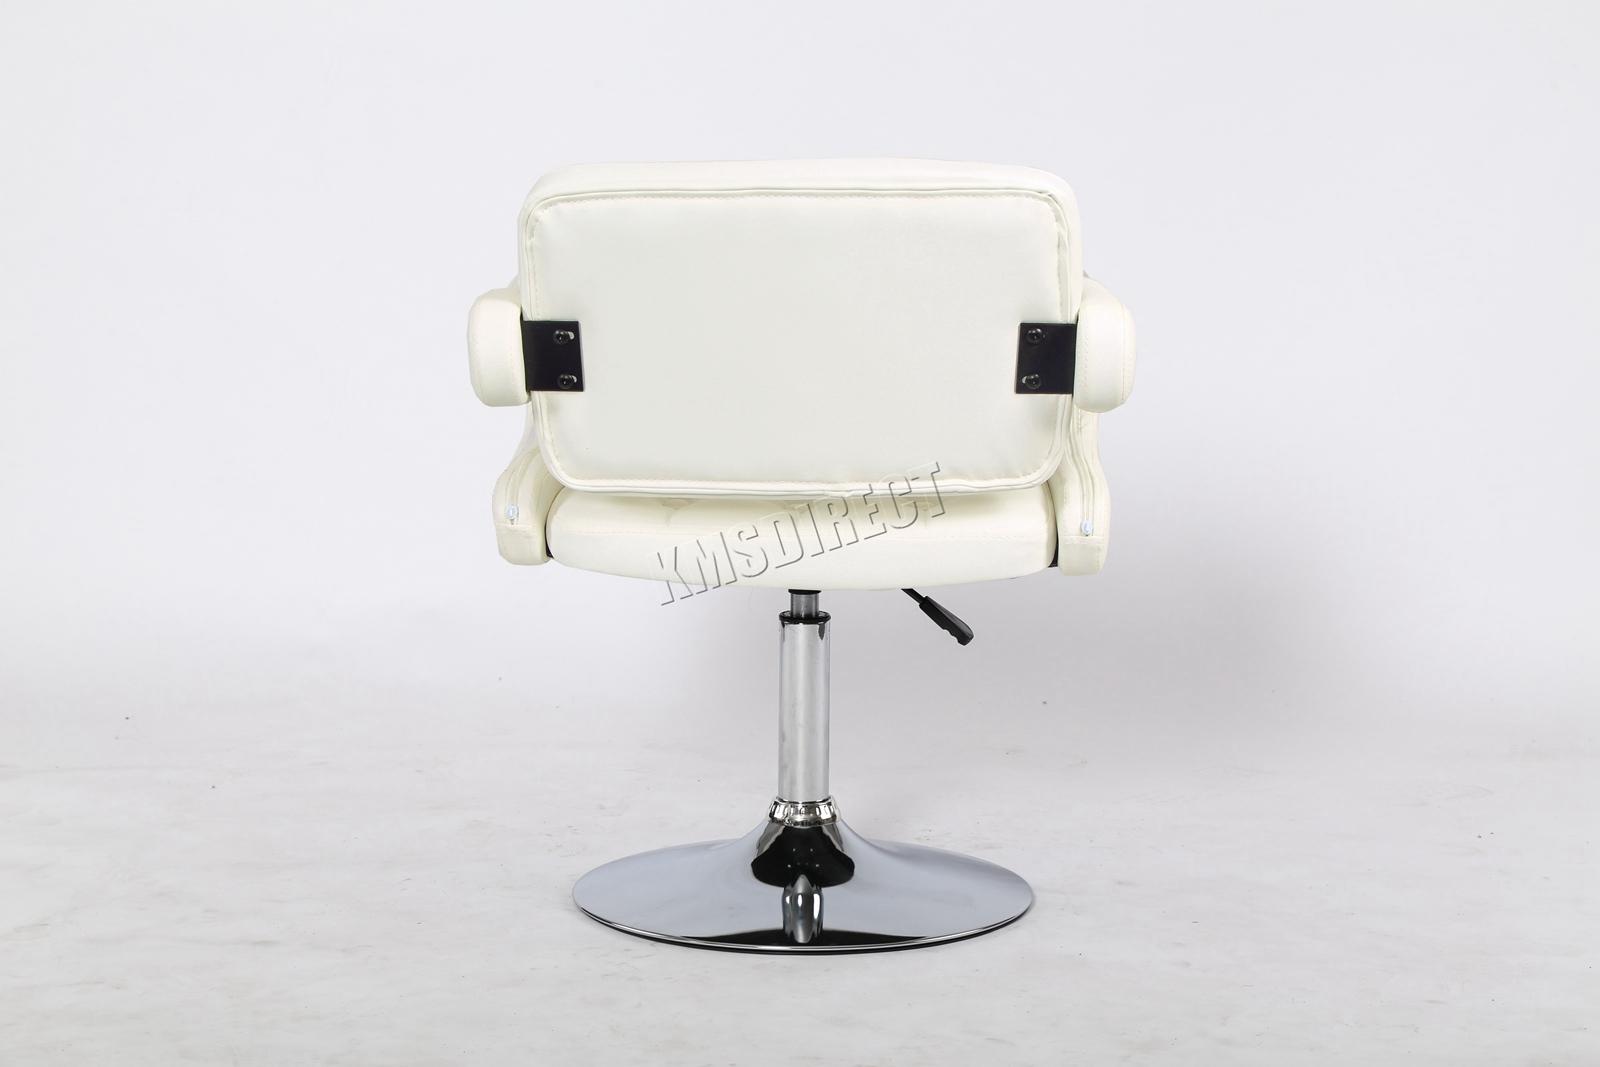 WestWood-Beauty-Salon-Chair-Barber-Hairdressing-Hair-Cut-PU-Leather-Modern-SC02 miniatuur 27